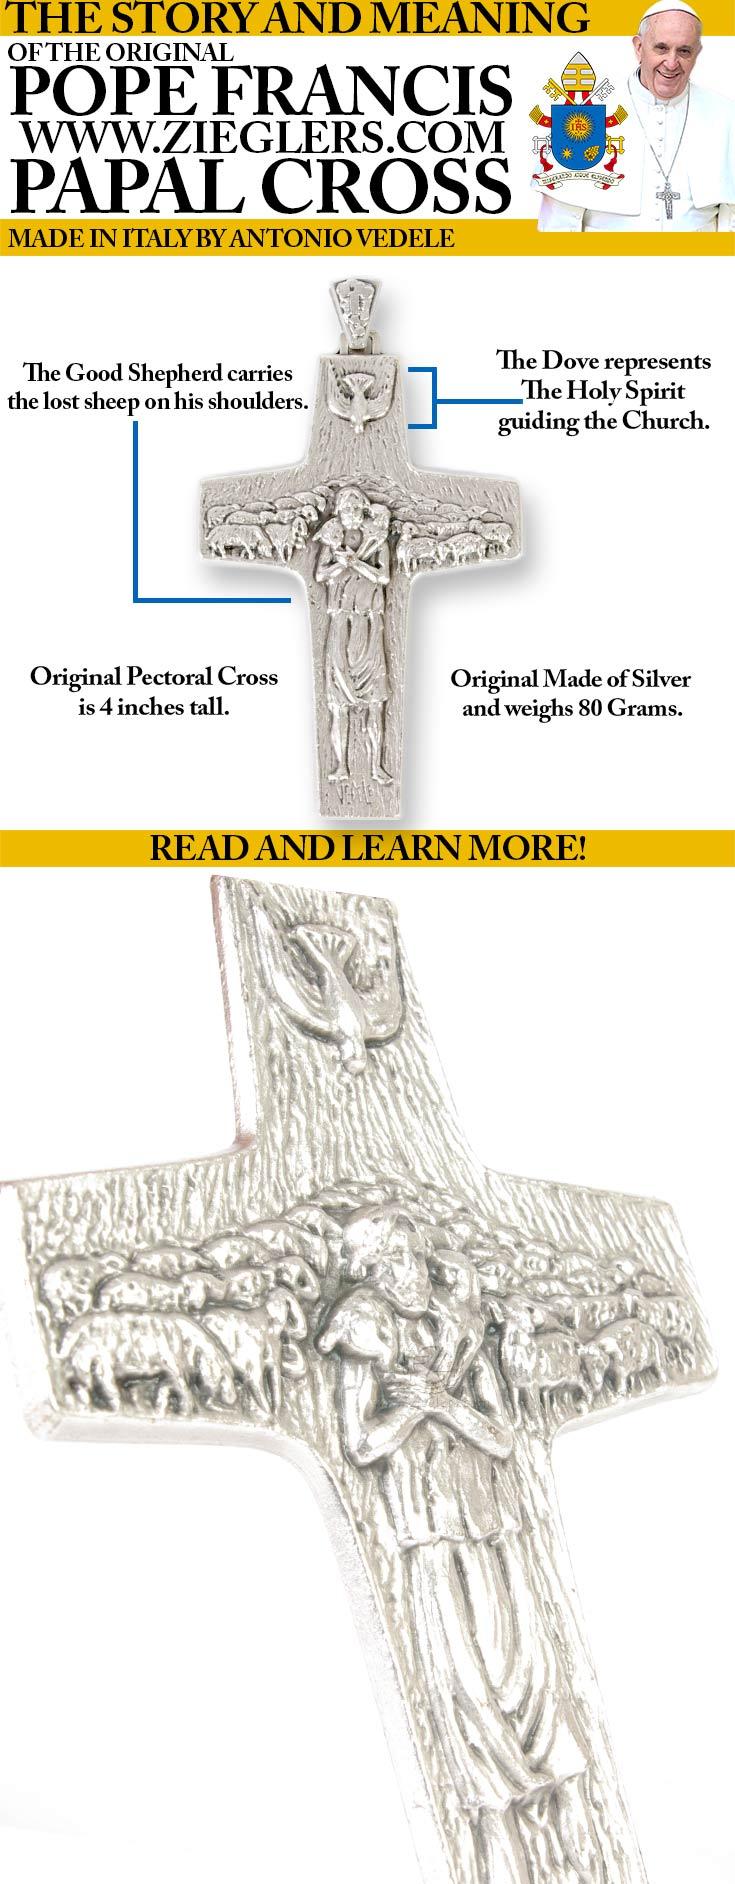 The original pope francis papal pectoral cross story and meaning the original pope francis papal pectoral cross story and meaning fc ziegler company biocorpaavc